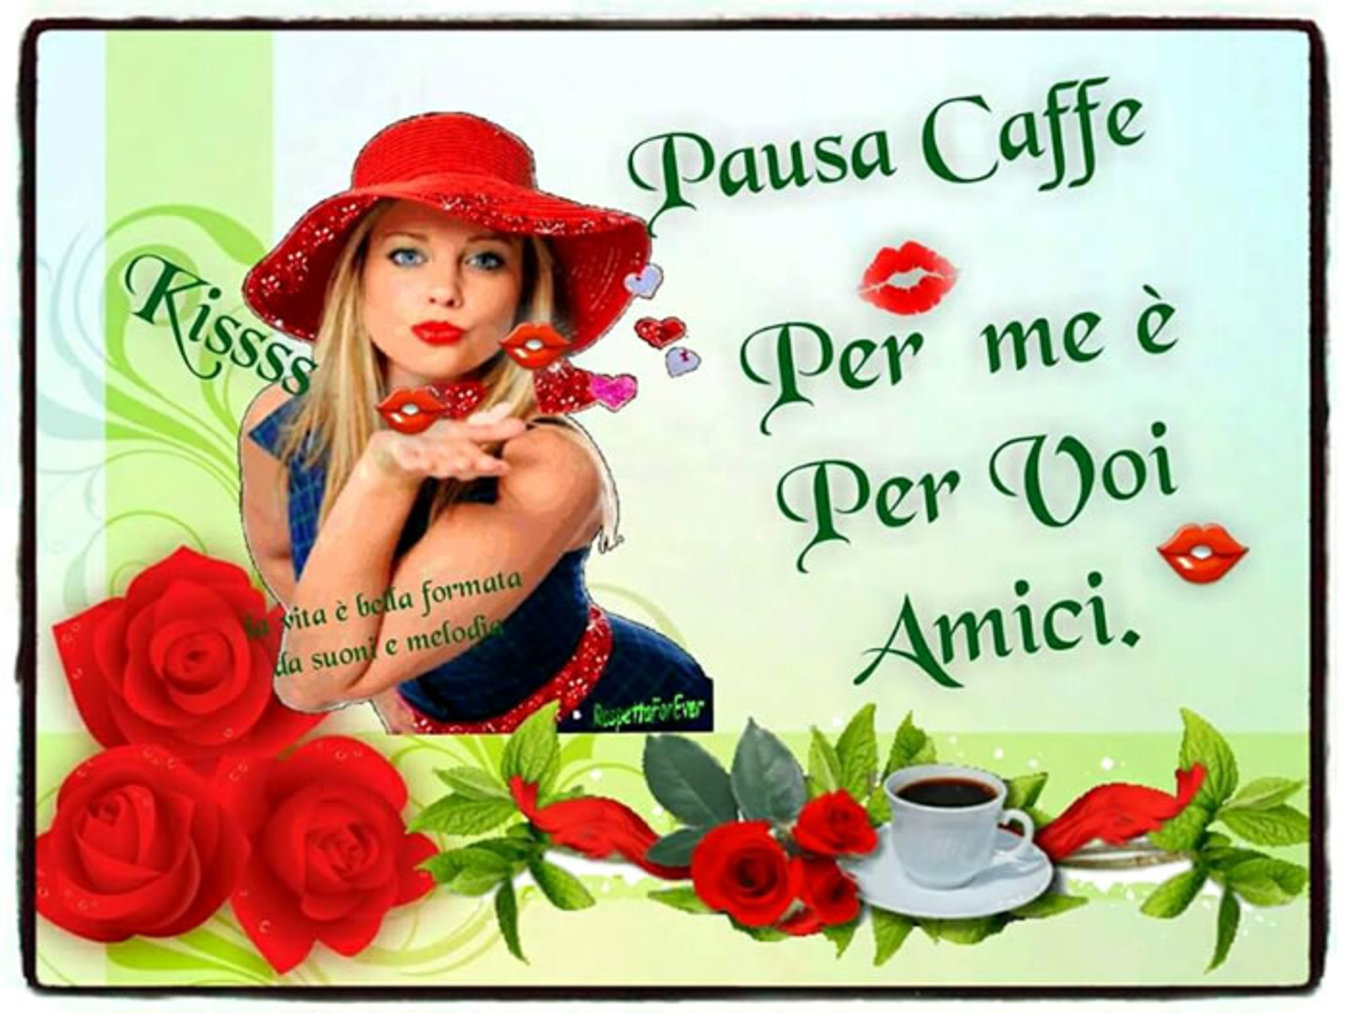 Caffè per tutti gli amici immagini